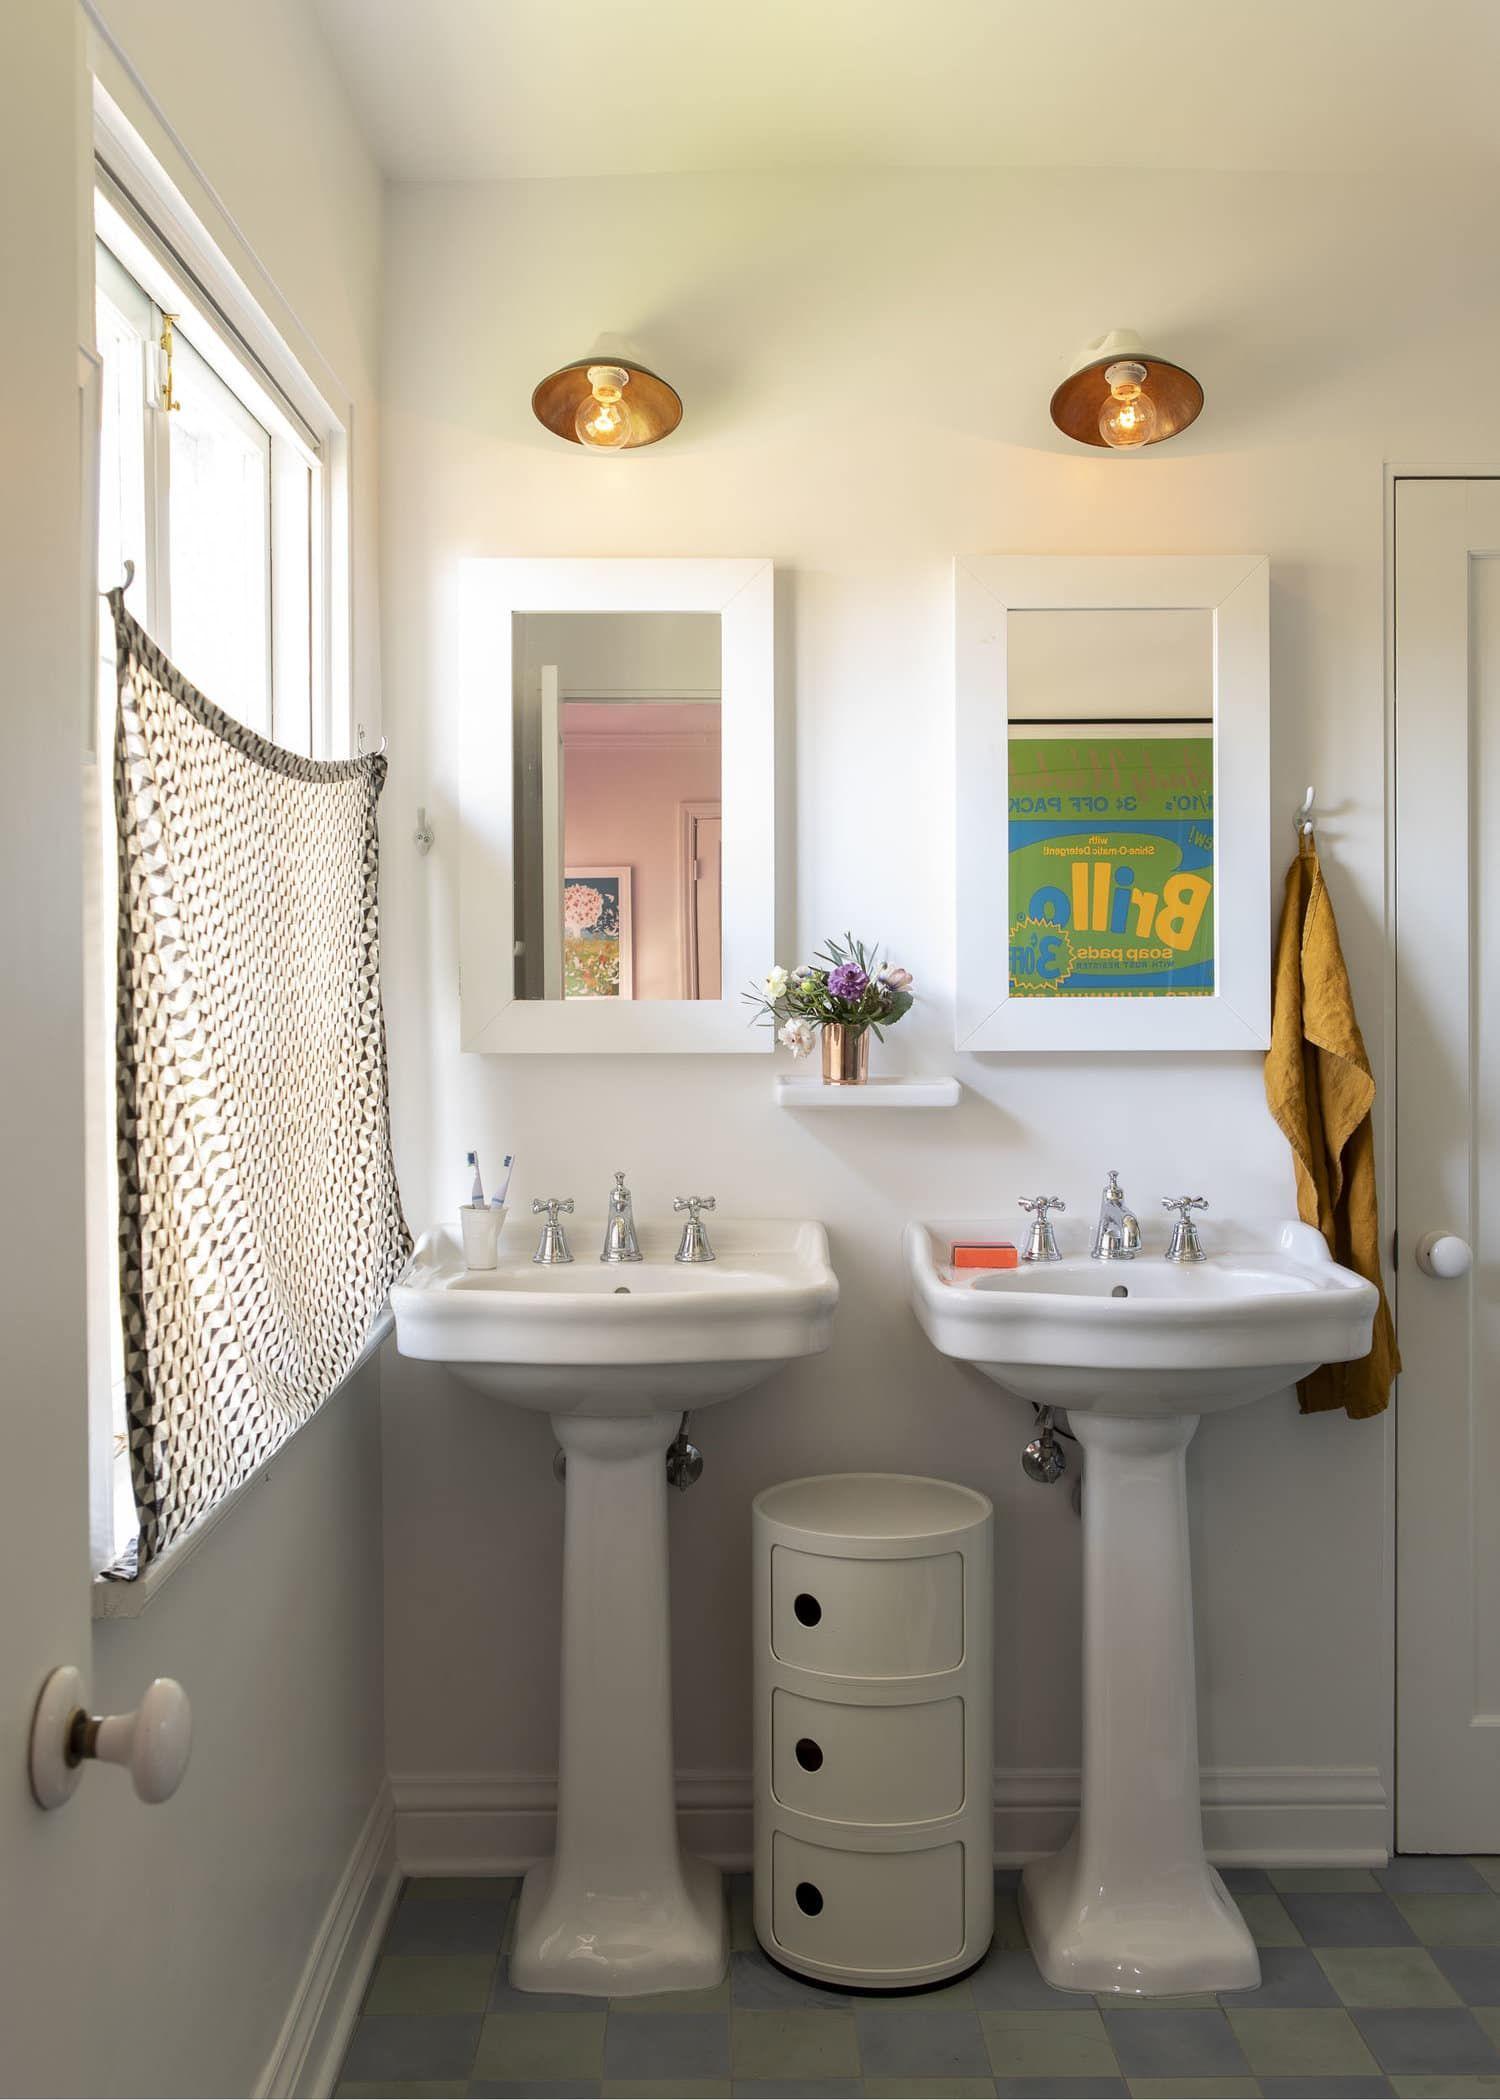 The 9 Best 2020 Bathroom Trends We Wish We Had Right Now Emily Henderson In 2020 Bathroom Trends Amazing Bathrooms Pretty Bathrooms